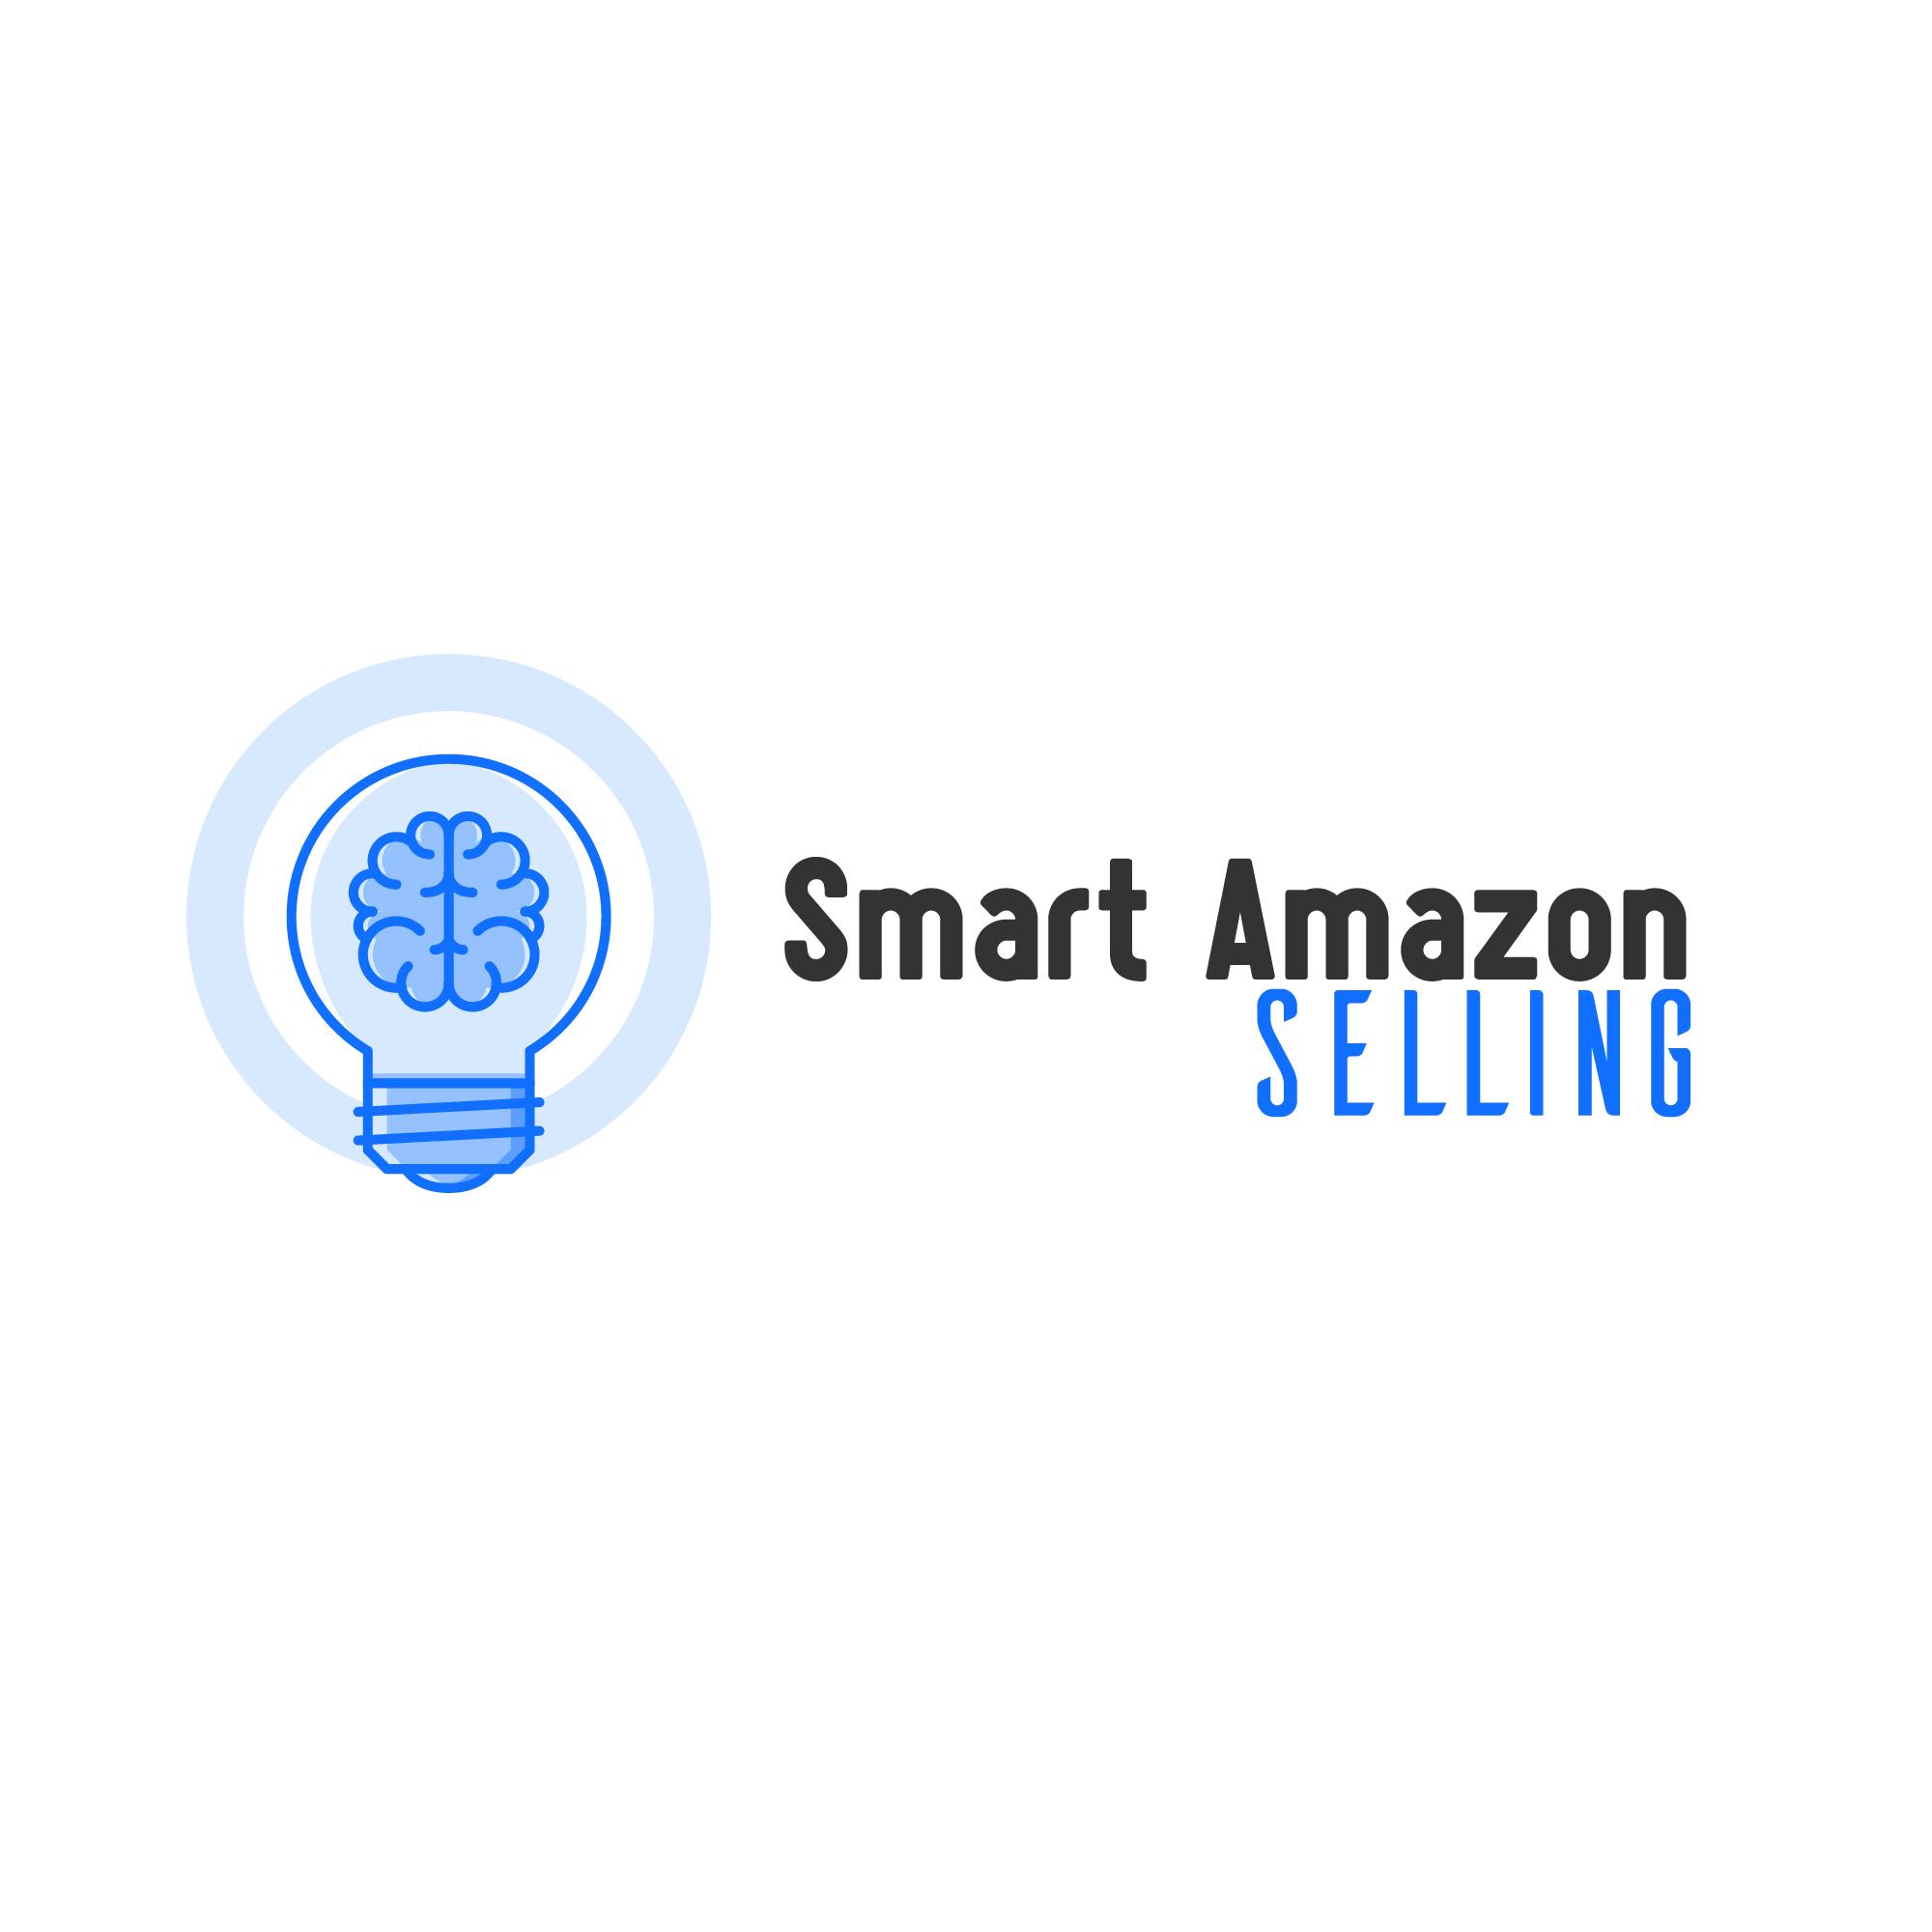 Smart Amazon Selling의 썸네일